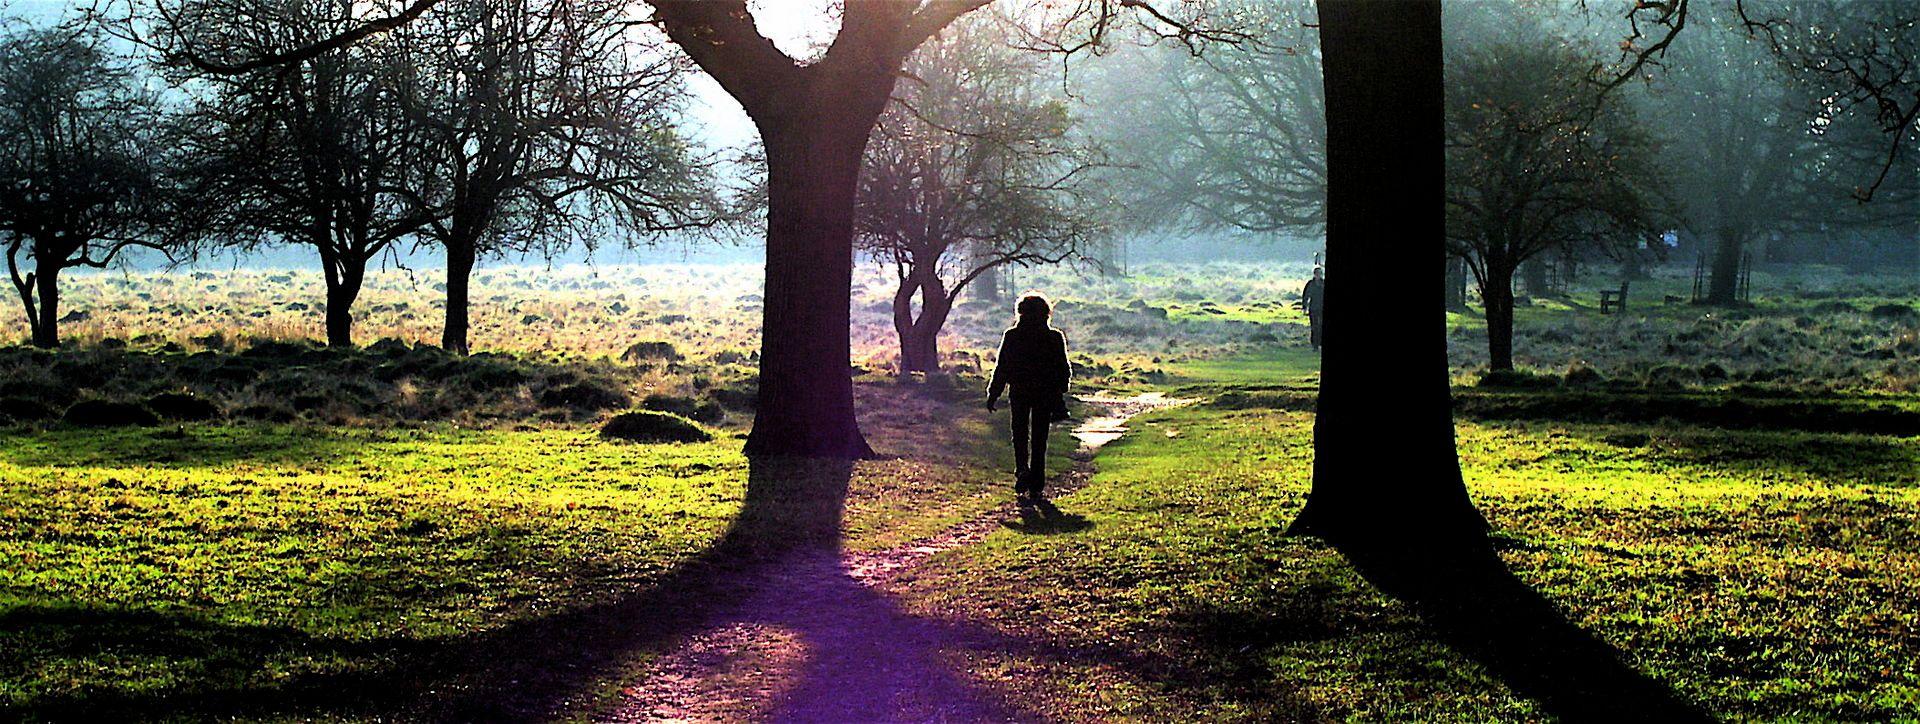 Midwinter_sunshine_in_Bushy_Park,_Teddington_P2120008